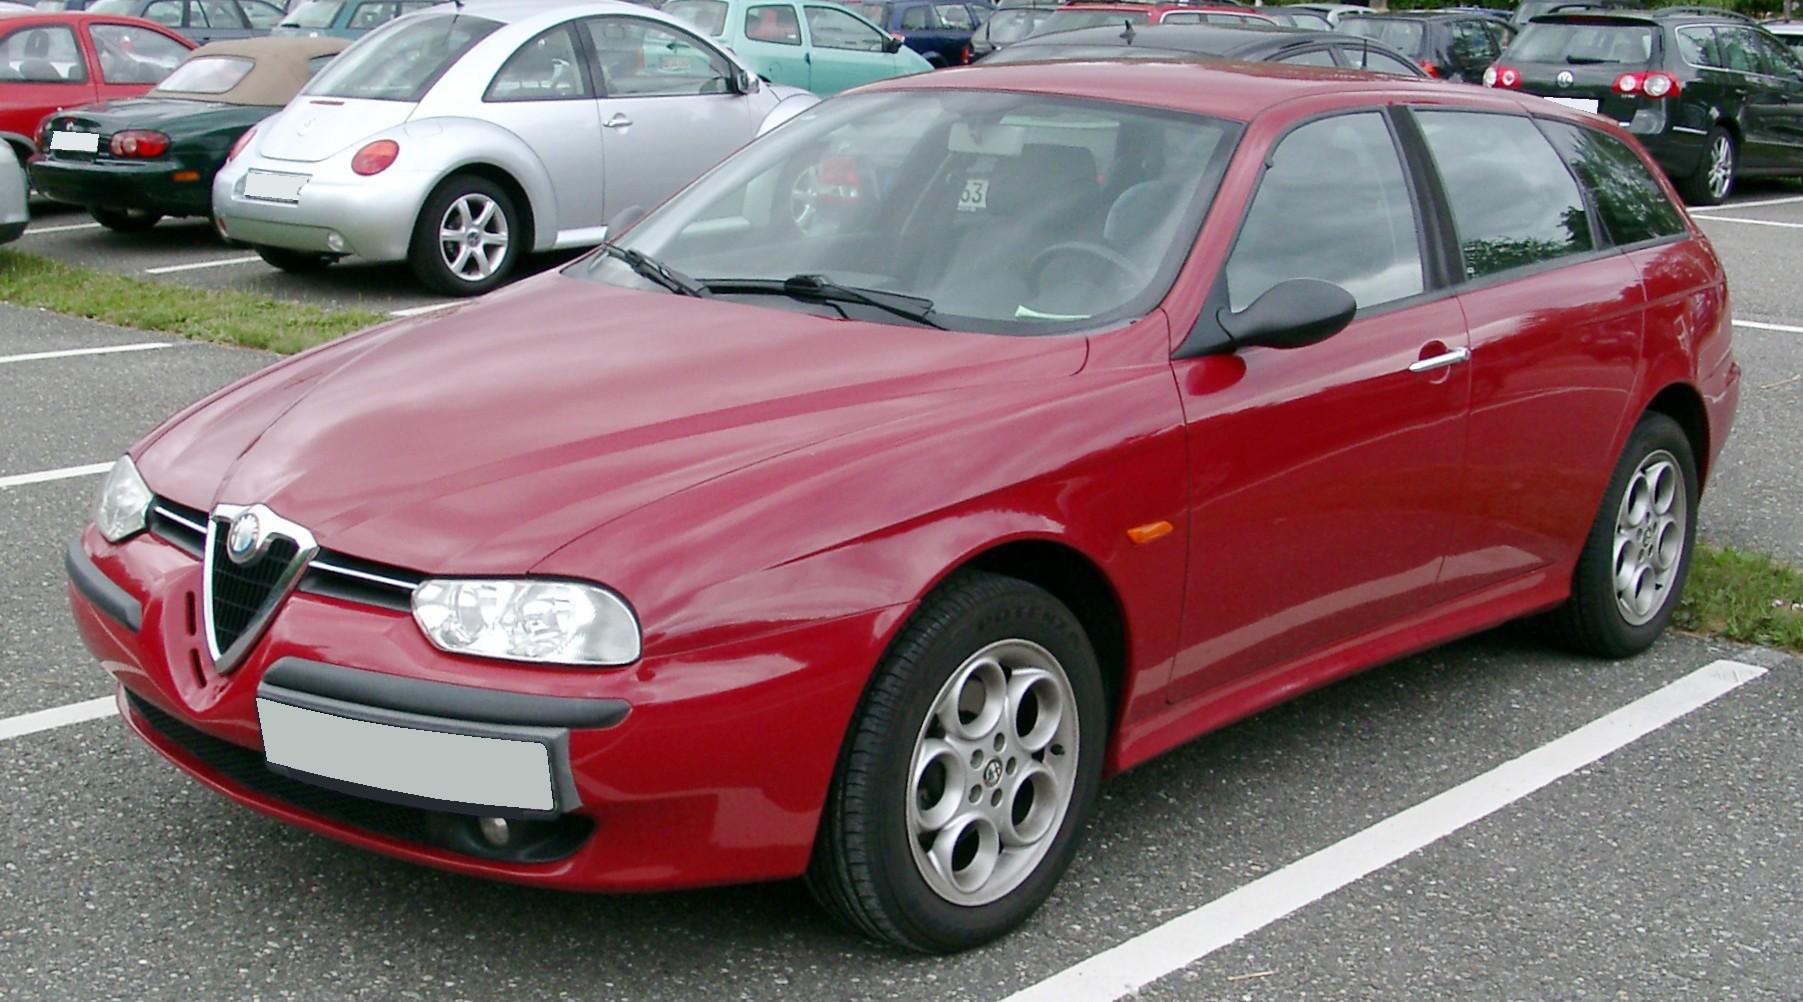 Alfa romeo 156 crosswagon wikipedia 14